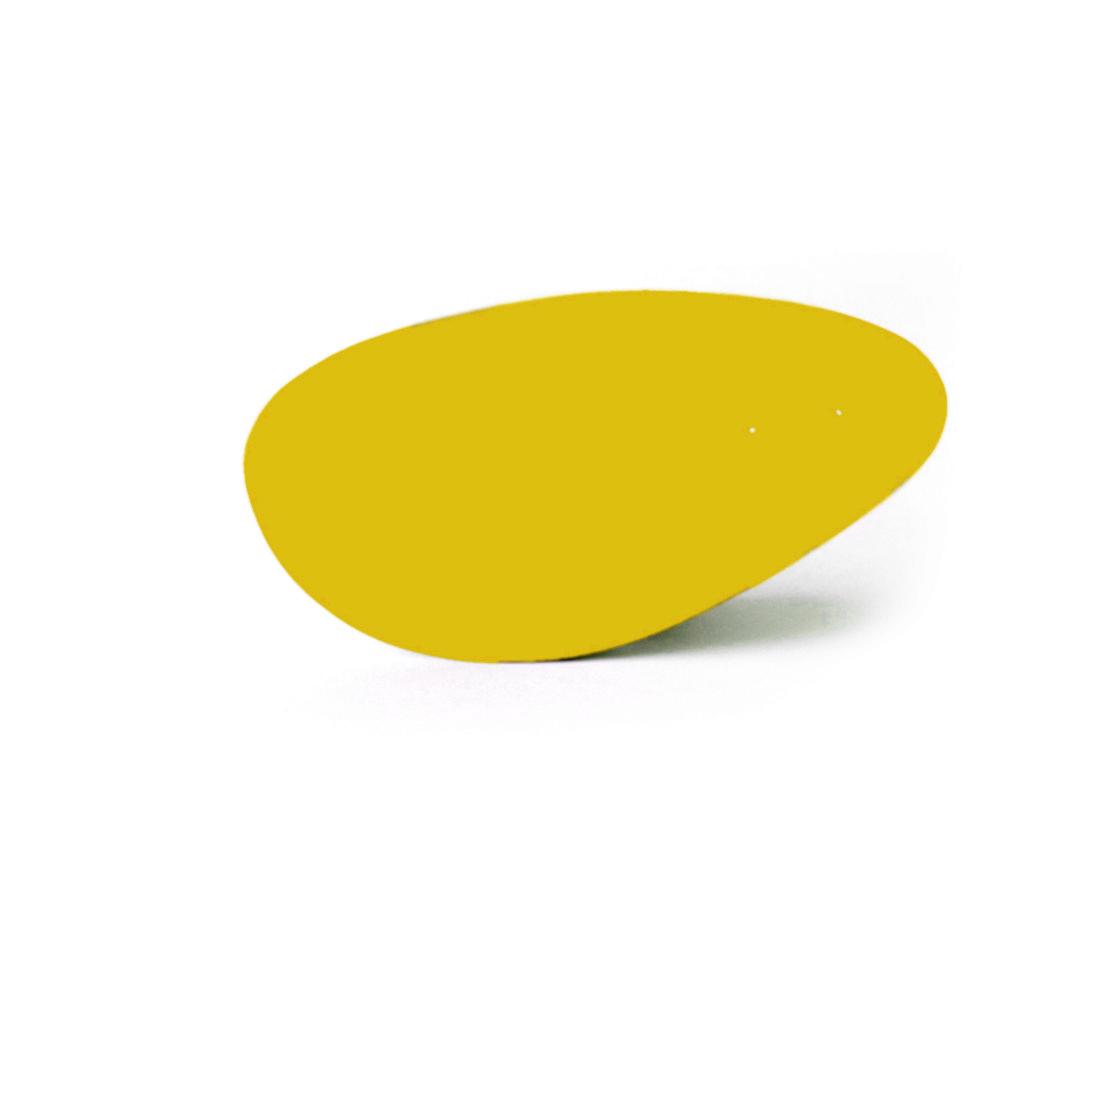 lemon yellow menhir, Virvoltan thin lacquered blade